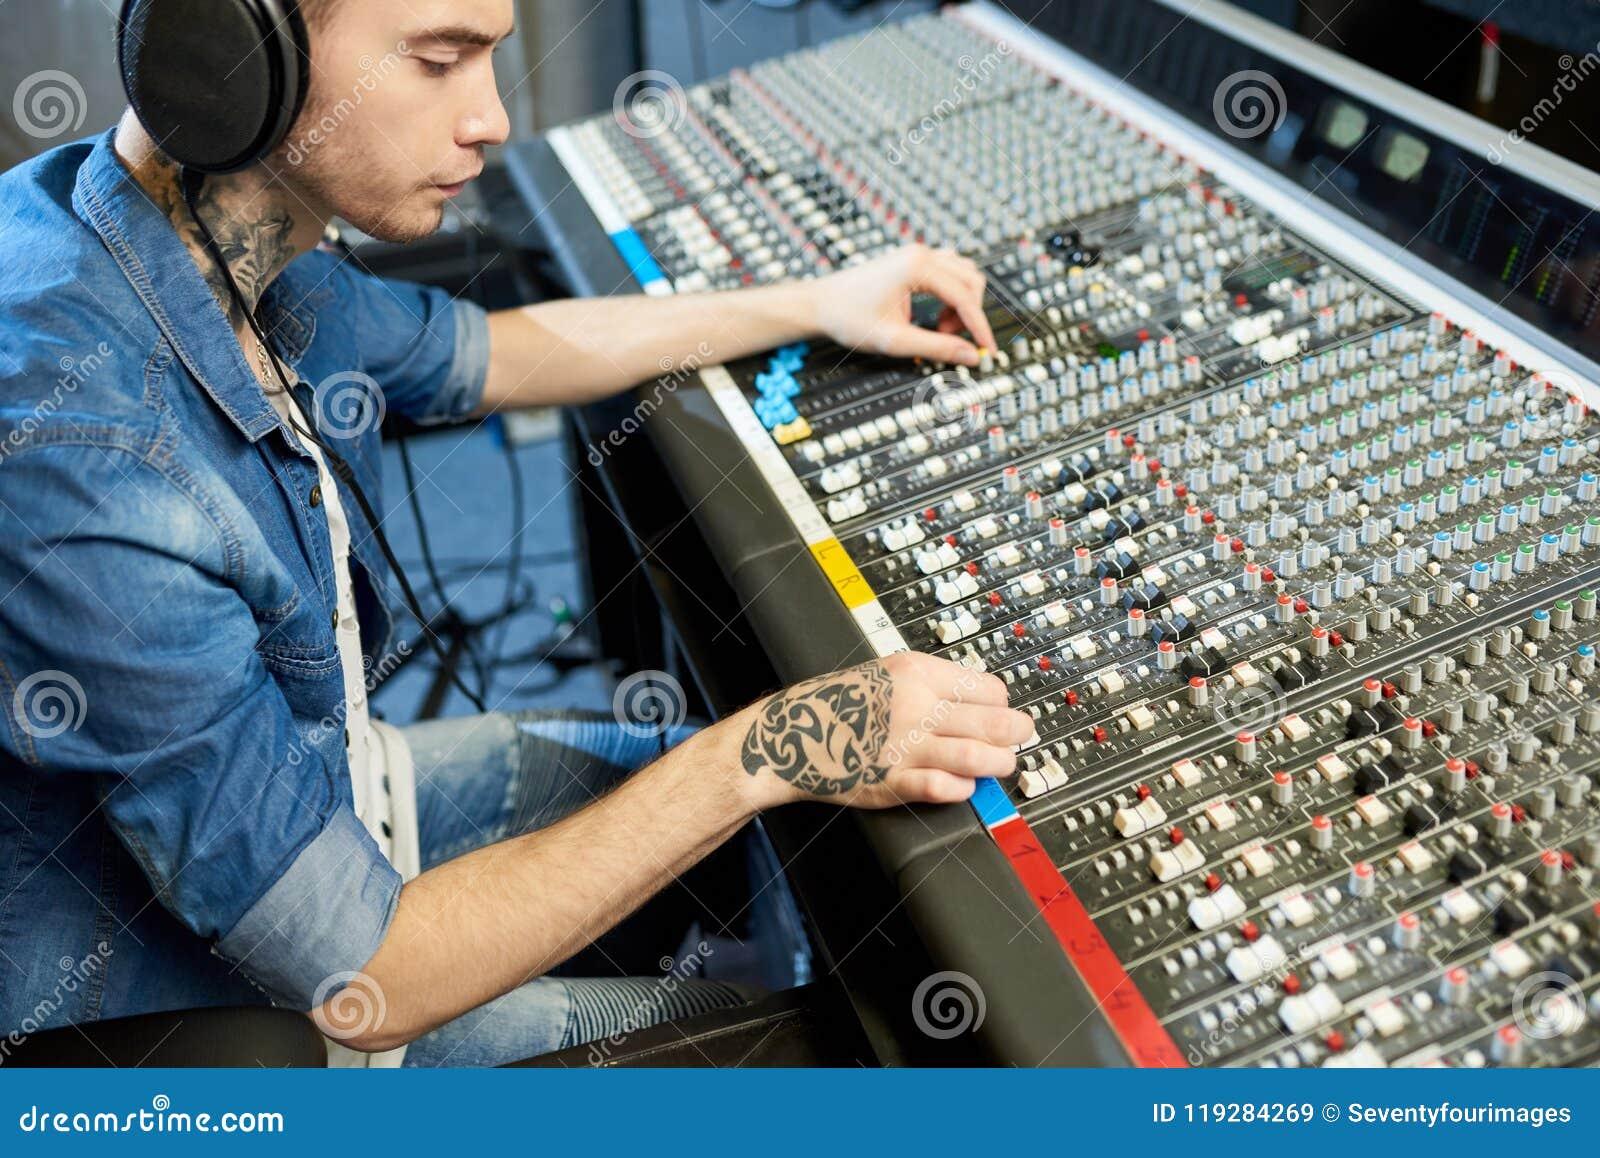 Man creating music in recording studio